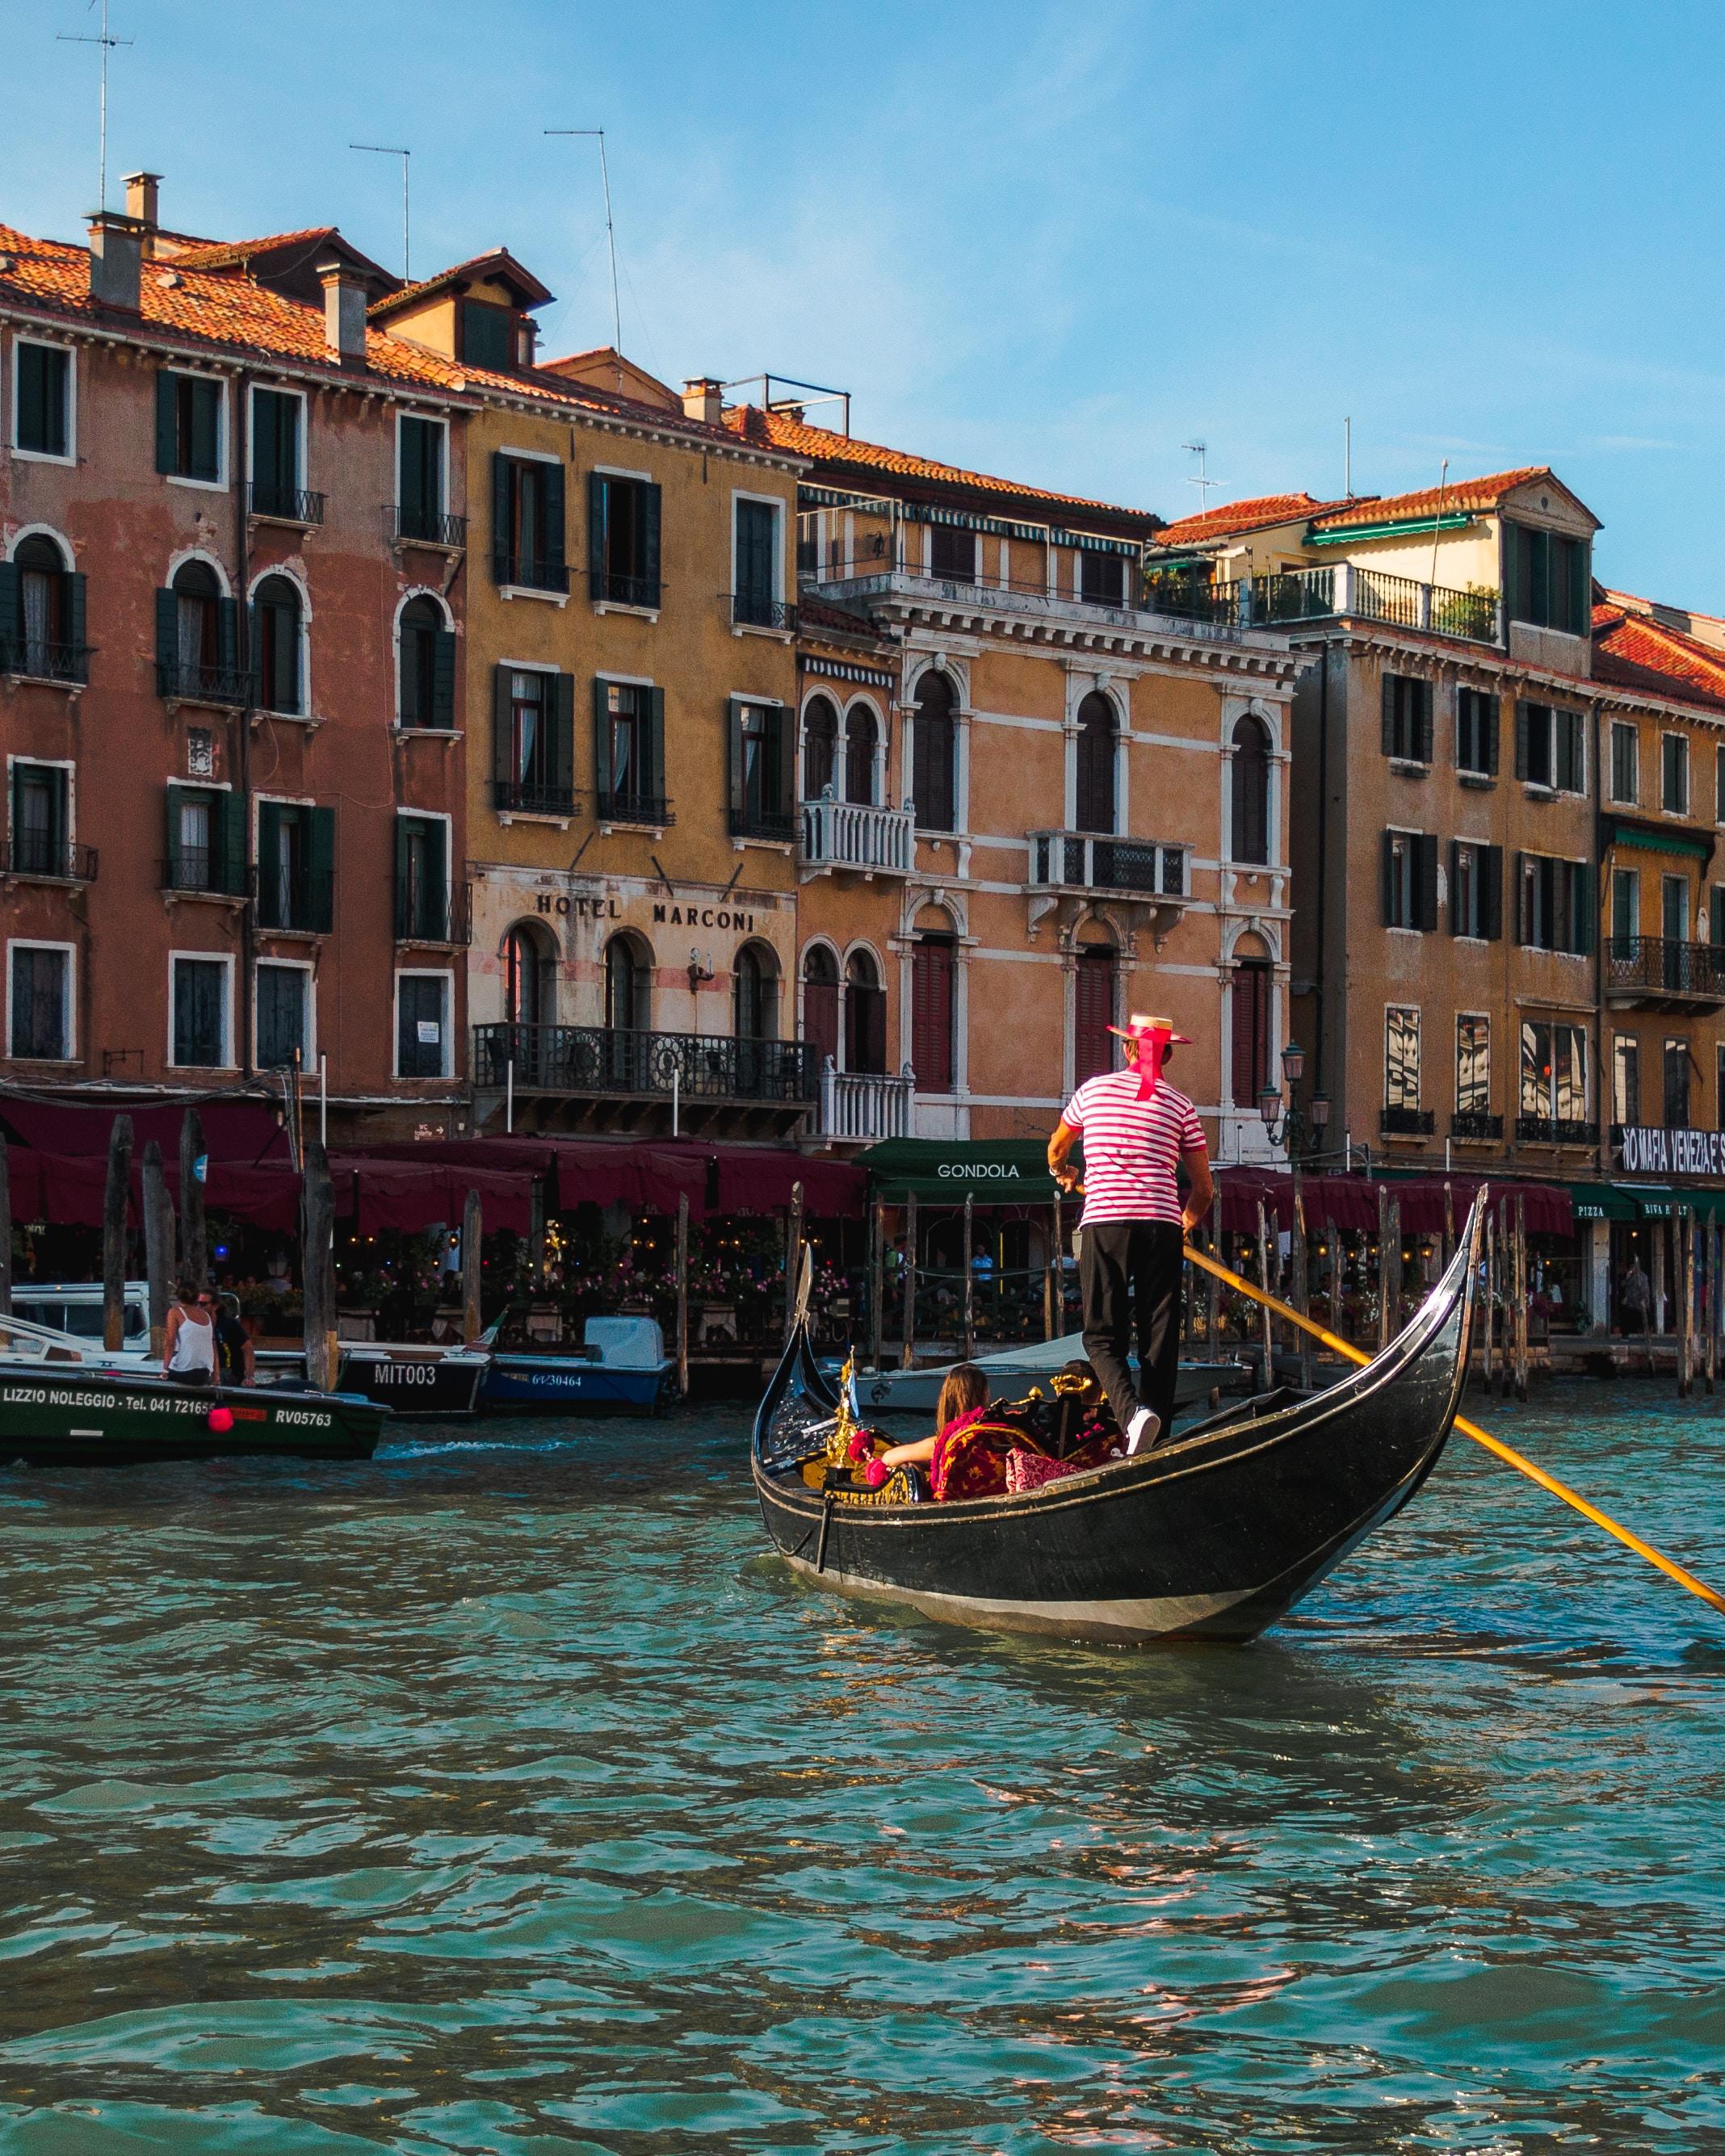 people riding boat beside buildings